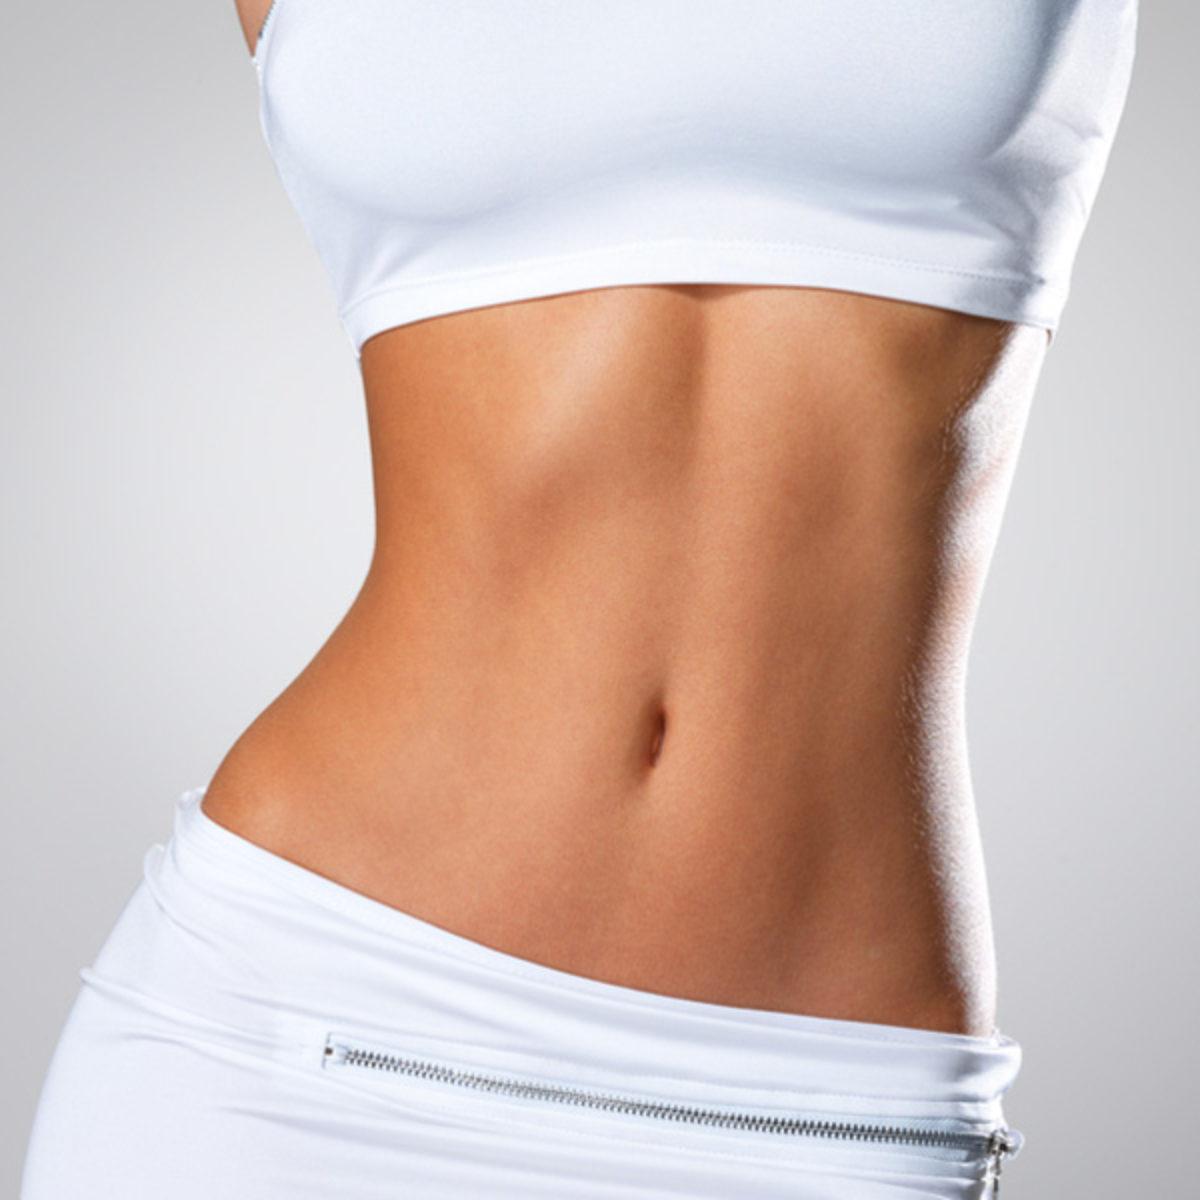 body-treatments-portfolio